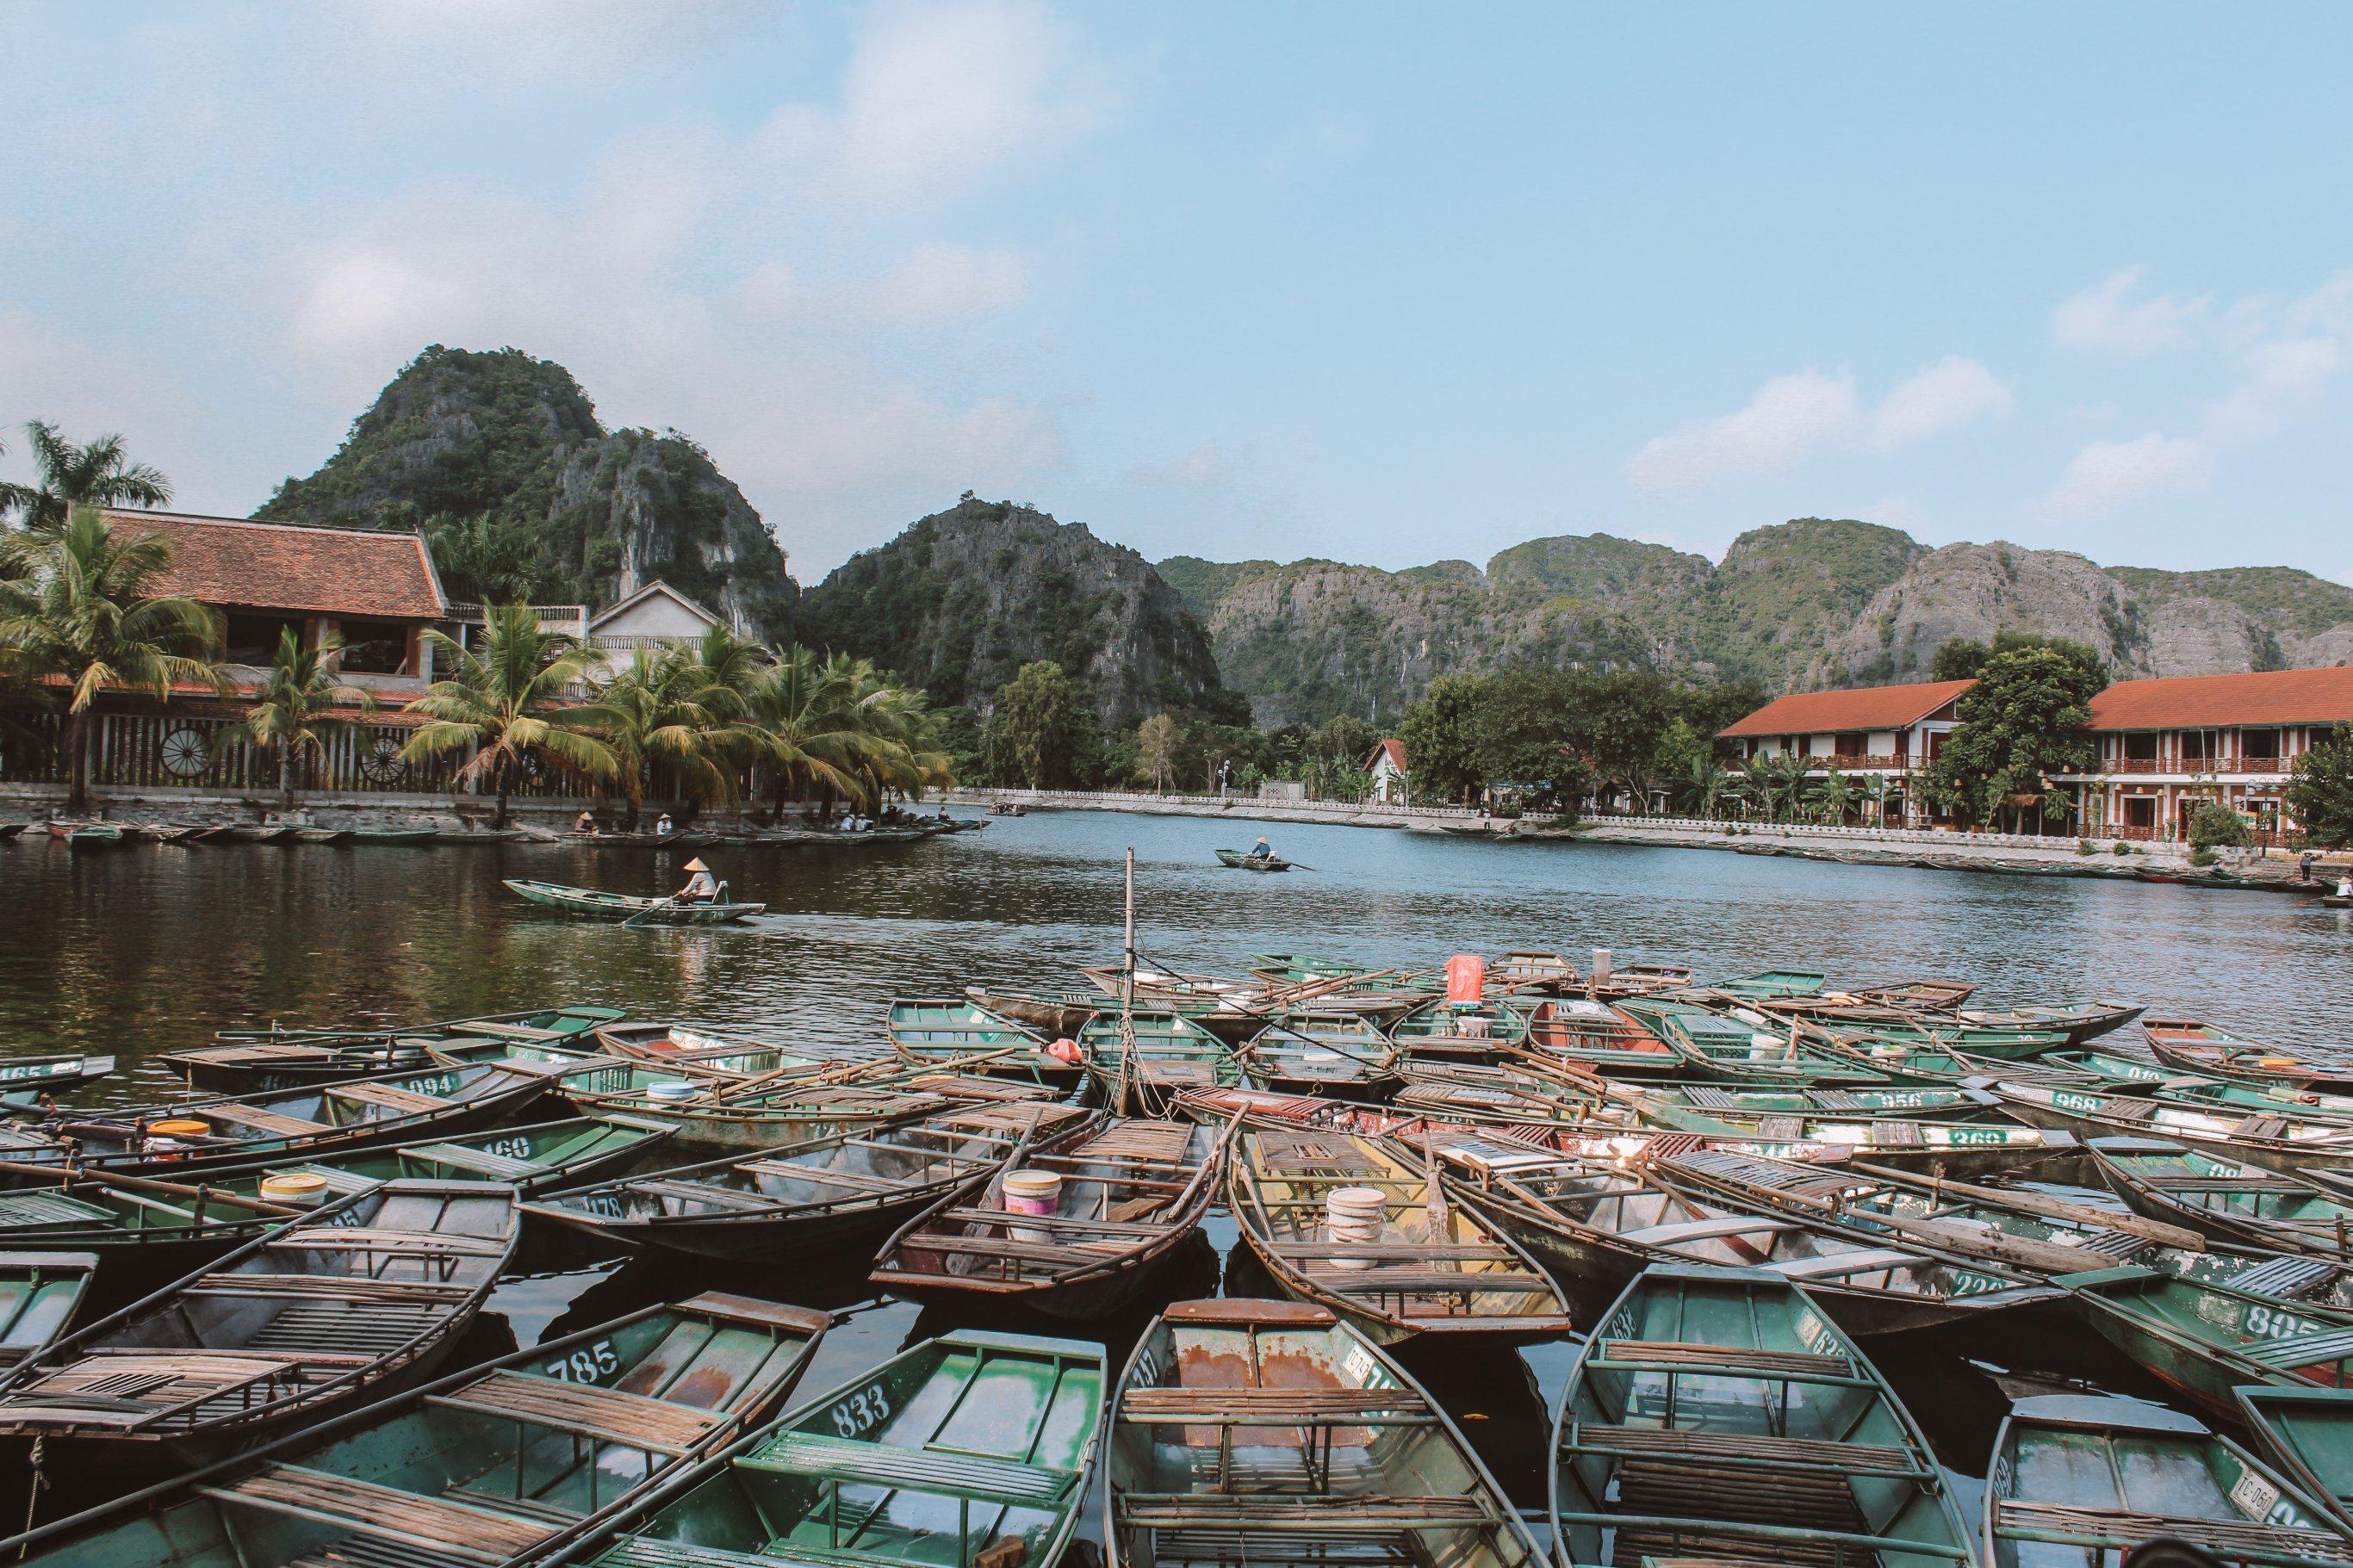 15-Day In-Depth Vietnam - Vietnam Itinerary